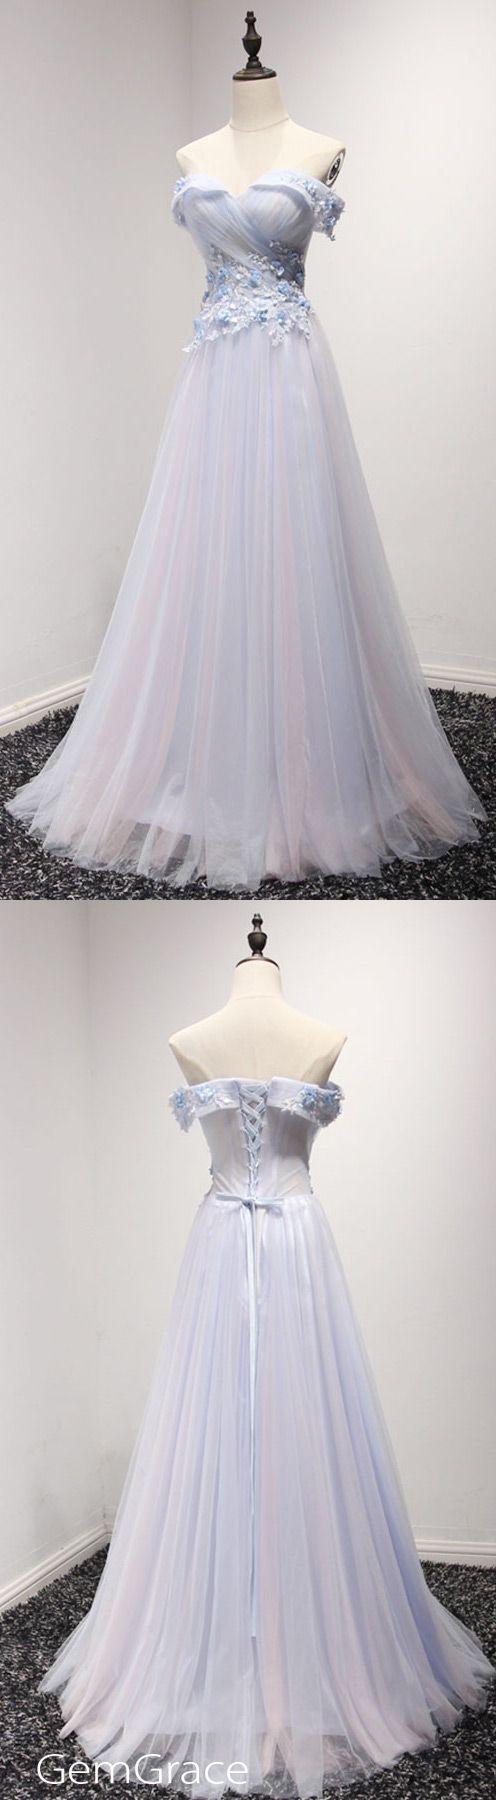 Elegantes Blau A Line Abendkleid Aus Der Schulter Lang Tüll Mit Applikationen Spitze # AY004 $ 169.99 – GemGrace.com